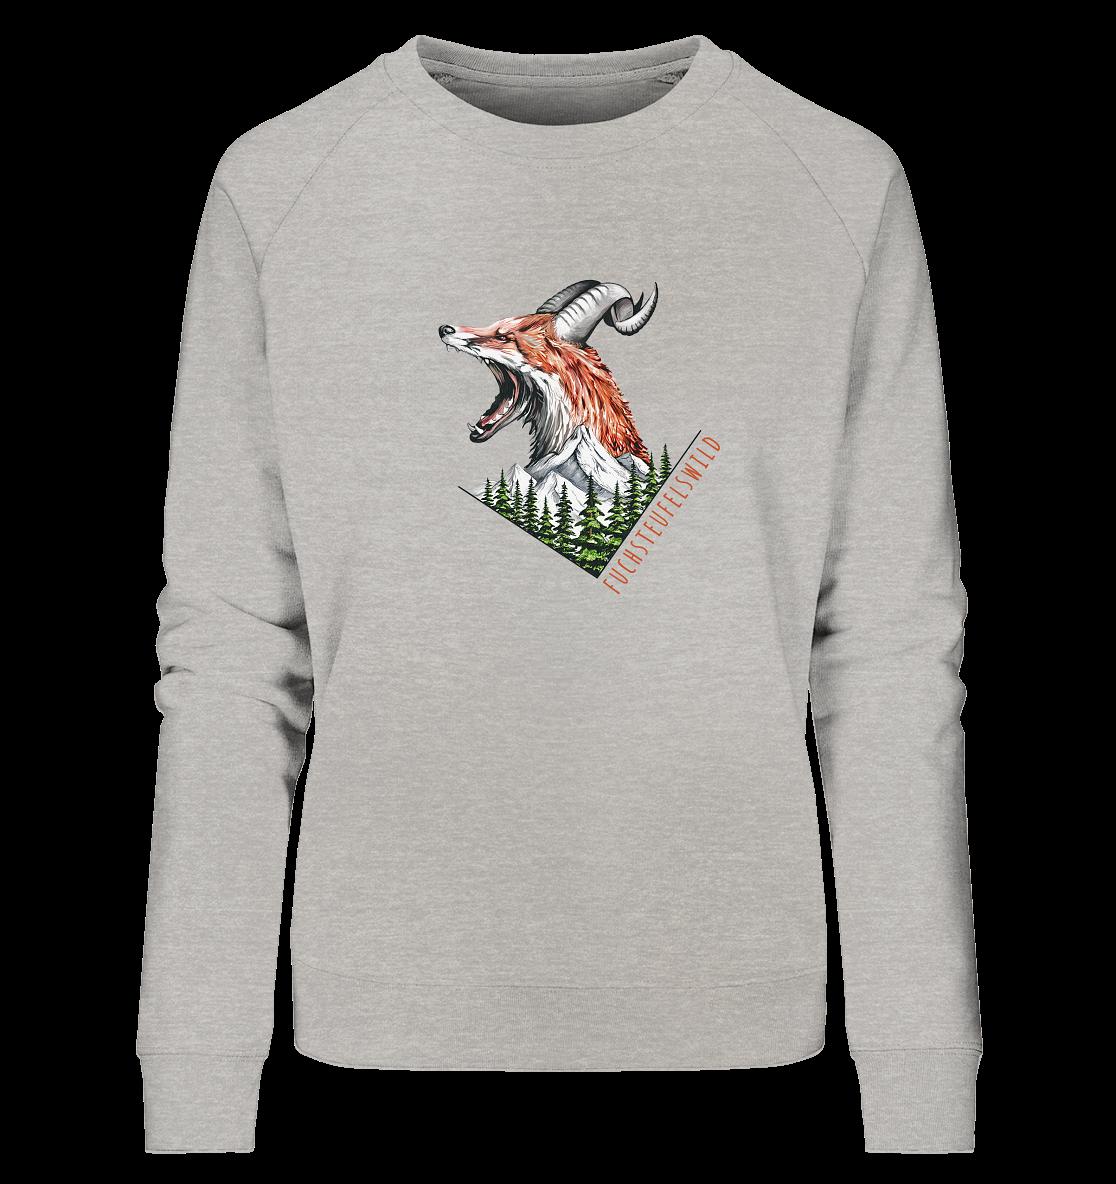 front-ladies-organic-sweatshirt-c2c1c0-1116x-1.png